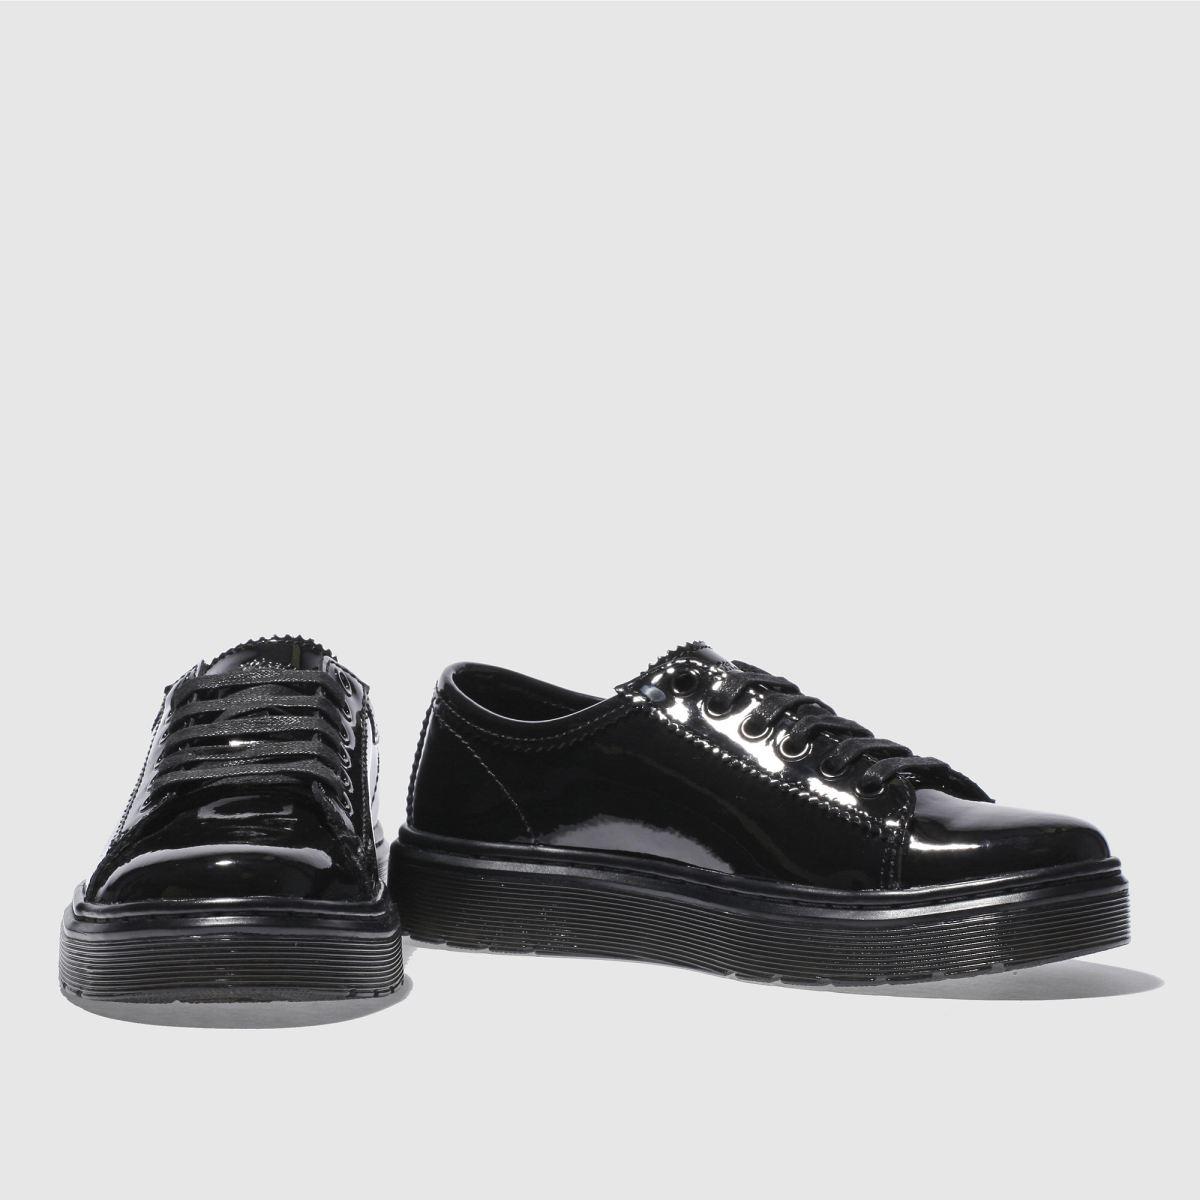 Damen Schwarz dr martens Patent Lyric Spin Lace Shoe Patent martens Flats | schuh Gute Qualität beliebte Schuhe 5c6234